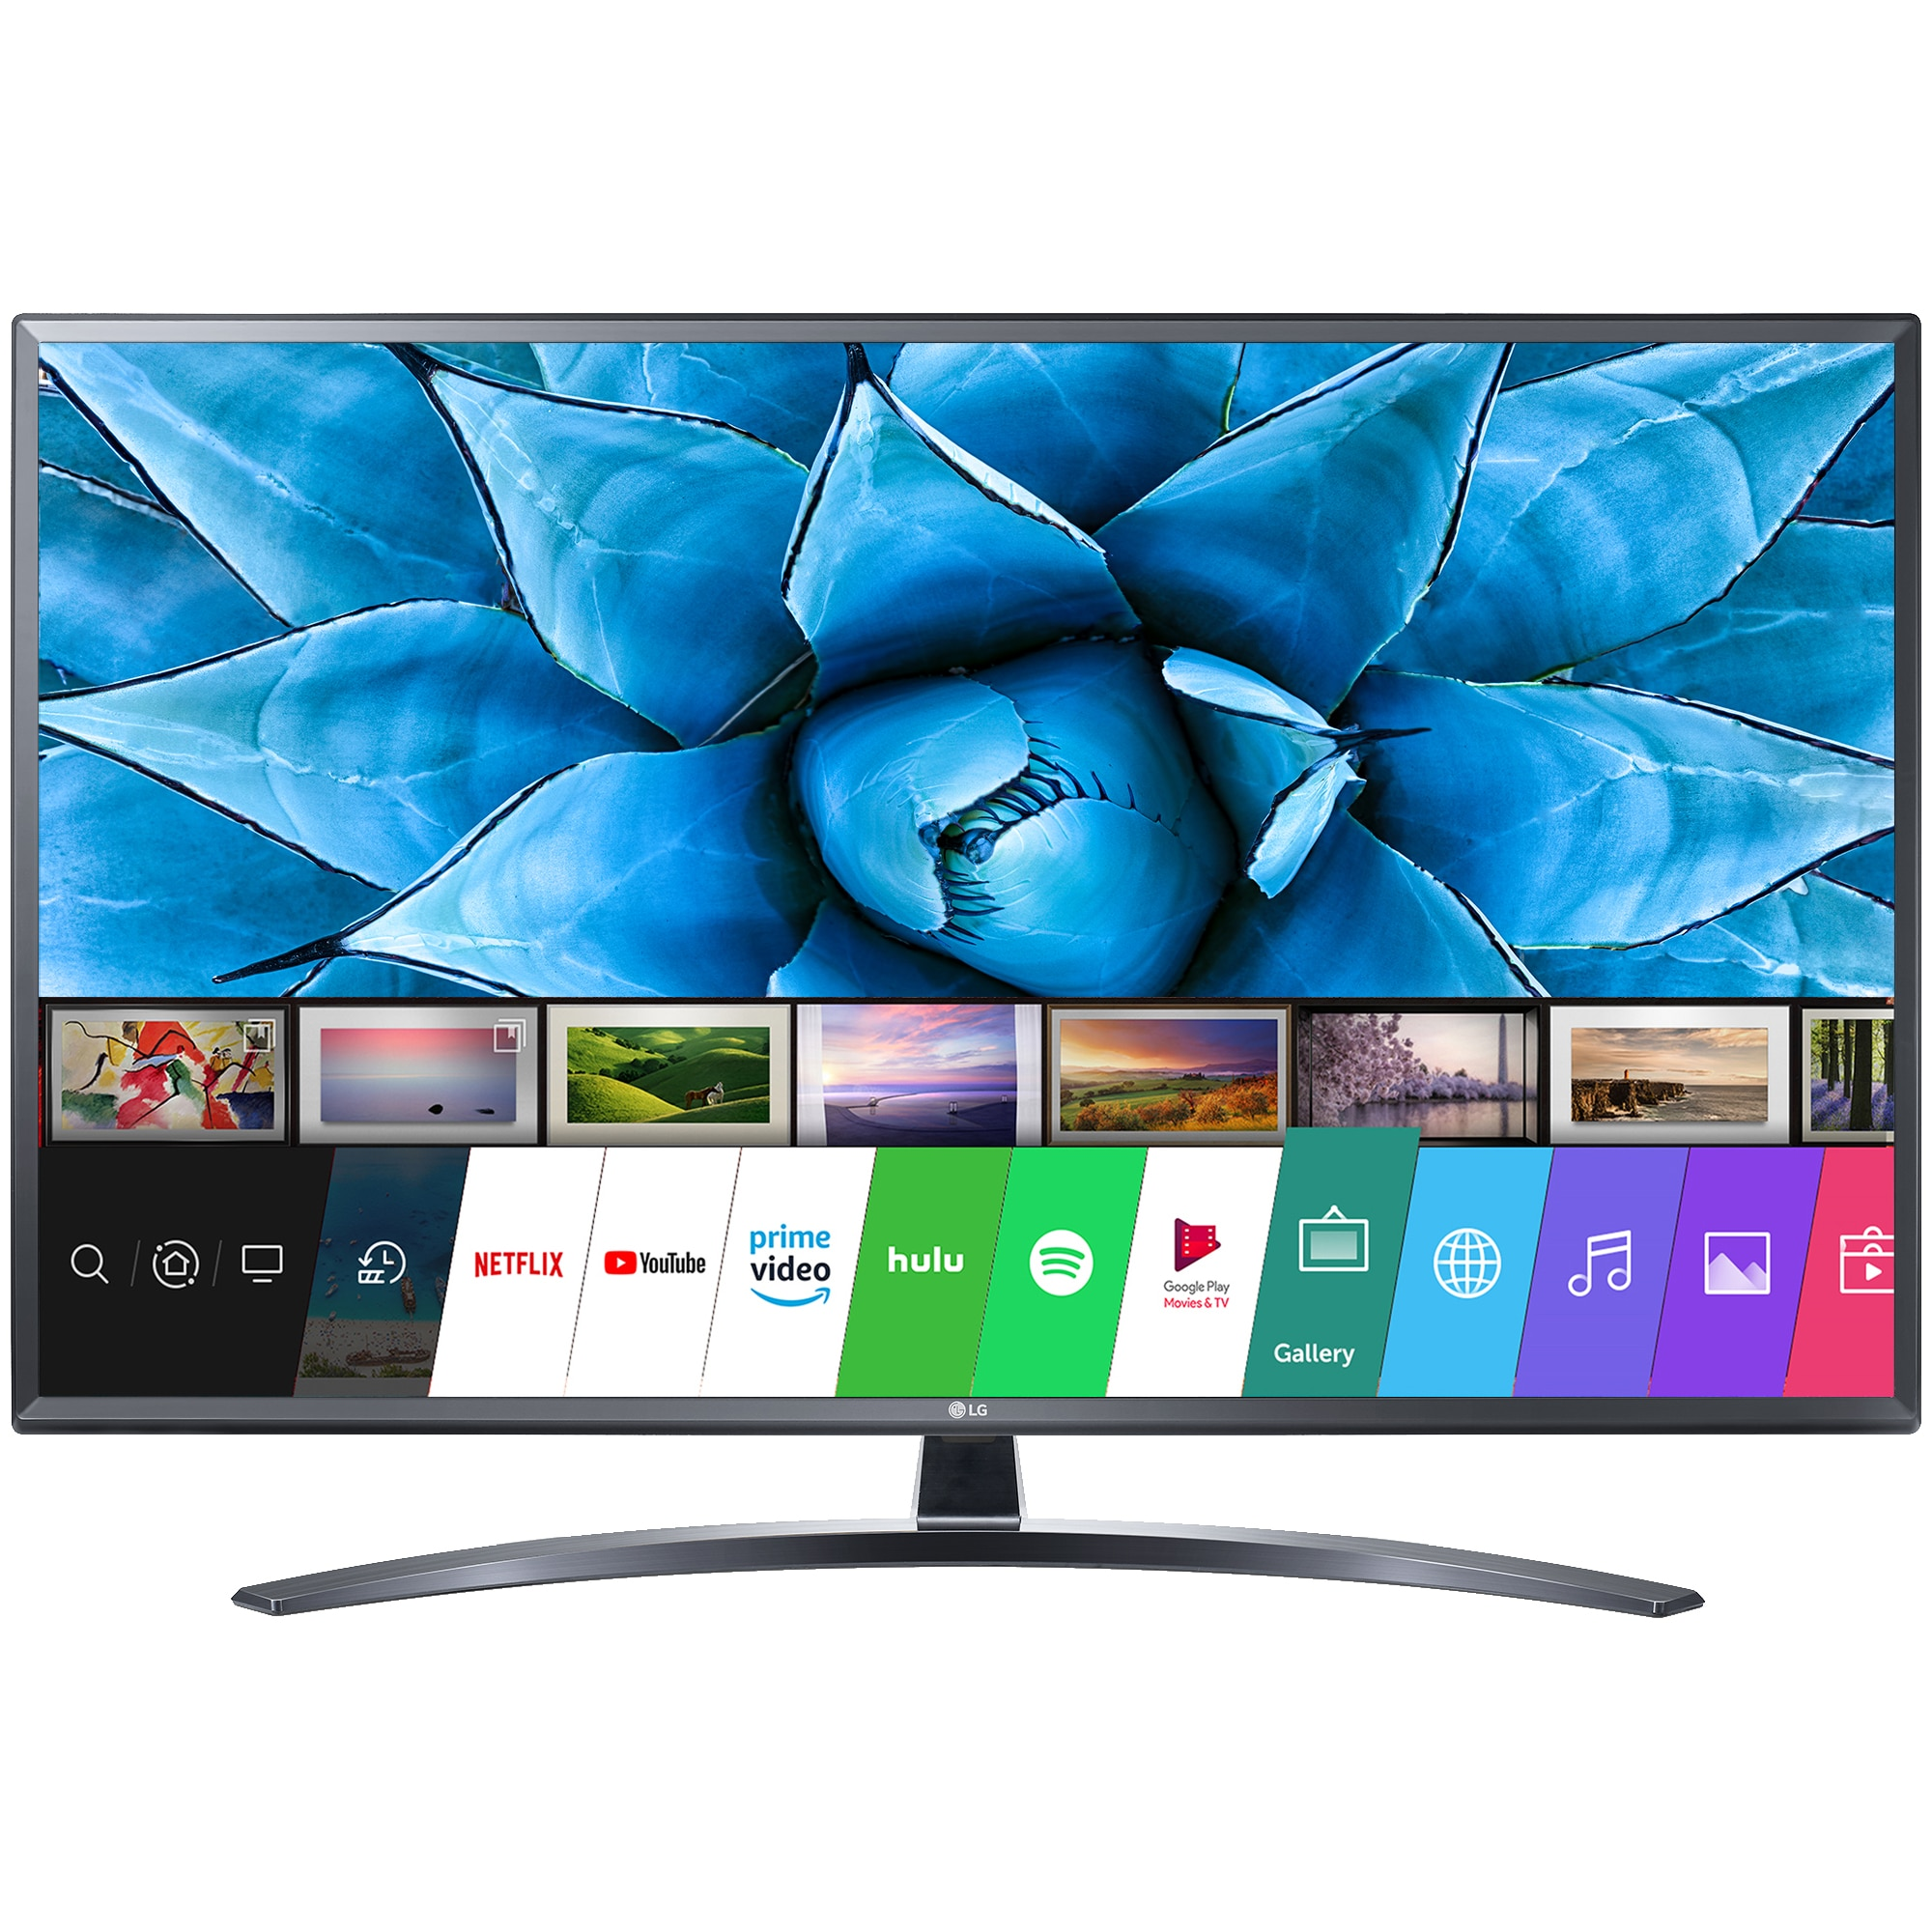 Fotografie Televizor LG 49UN74003LB, 123 cm, Smart, 4K Ultra HD, LED, Clasa F